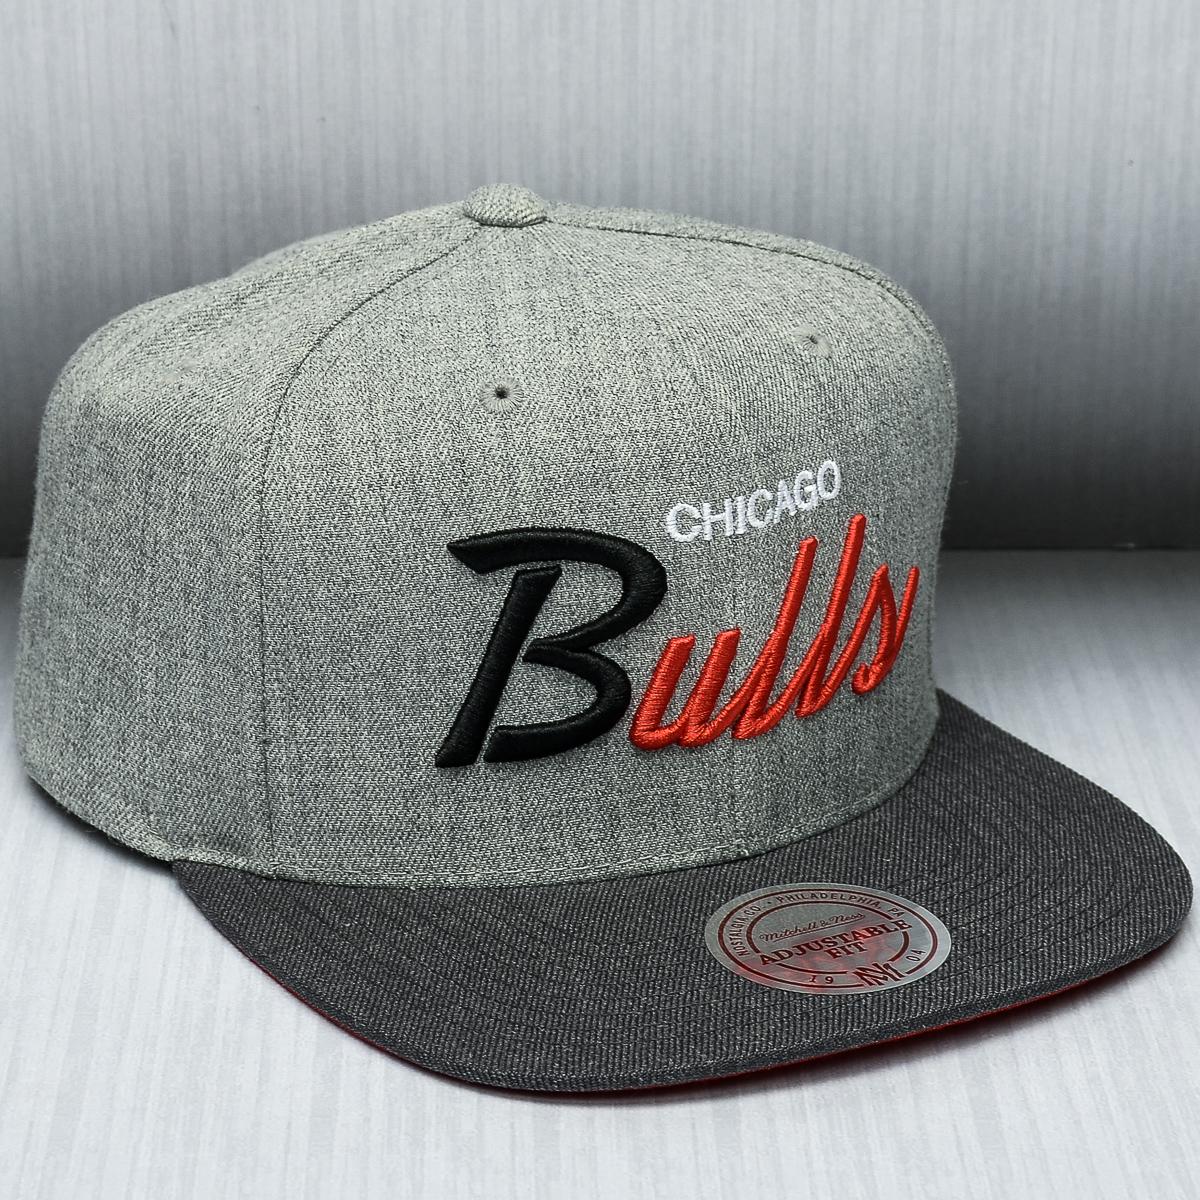 9e36db8c4 Mitchell & Ness NBA Chicago Bulls TRI POP SPECIAL SCRIPT Snapback Cap - NBA  Shop Chicago Bulls Merchandise - Superfanas.lt